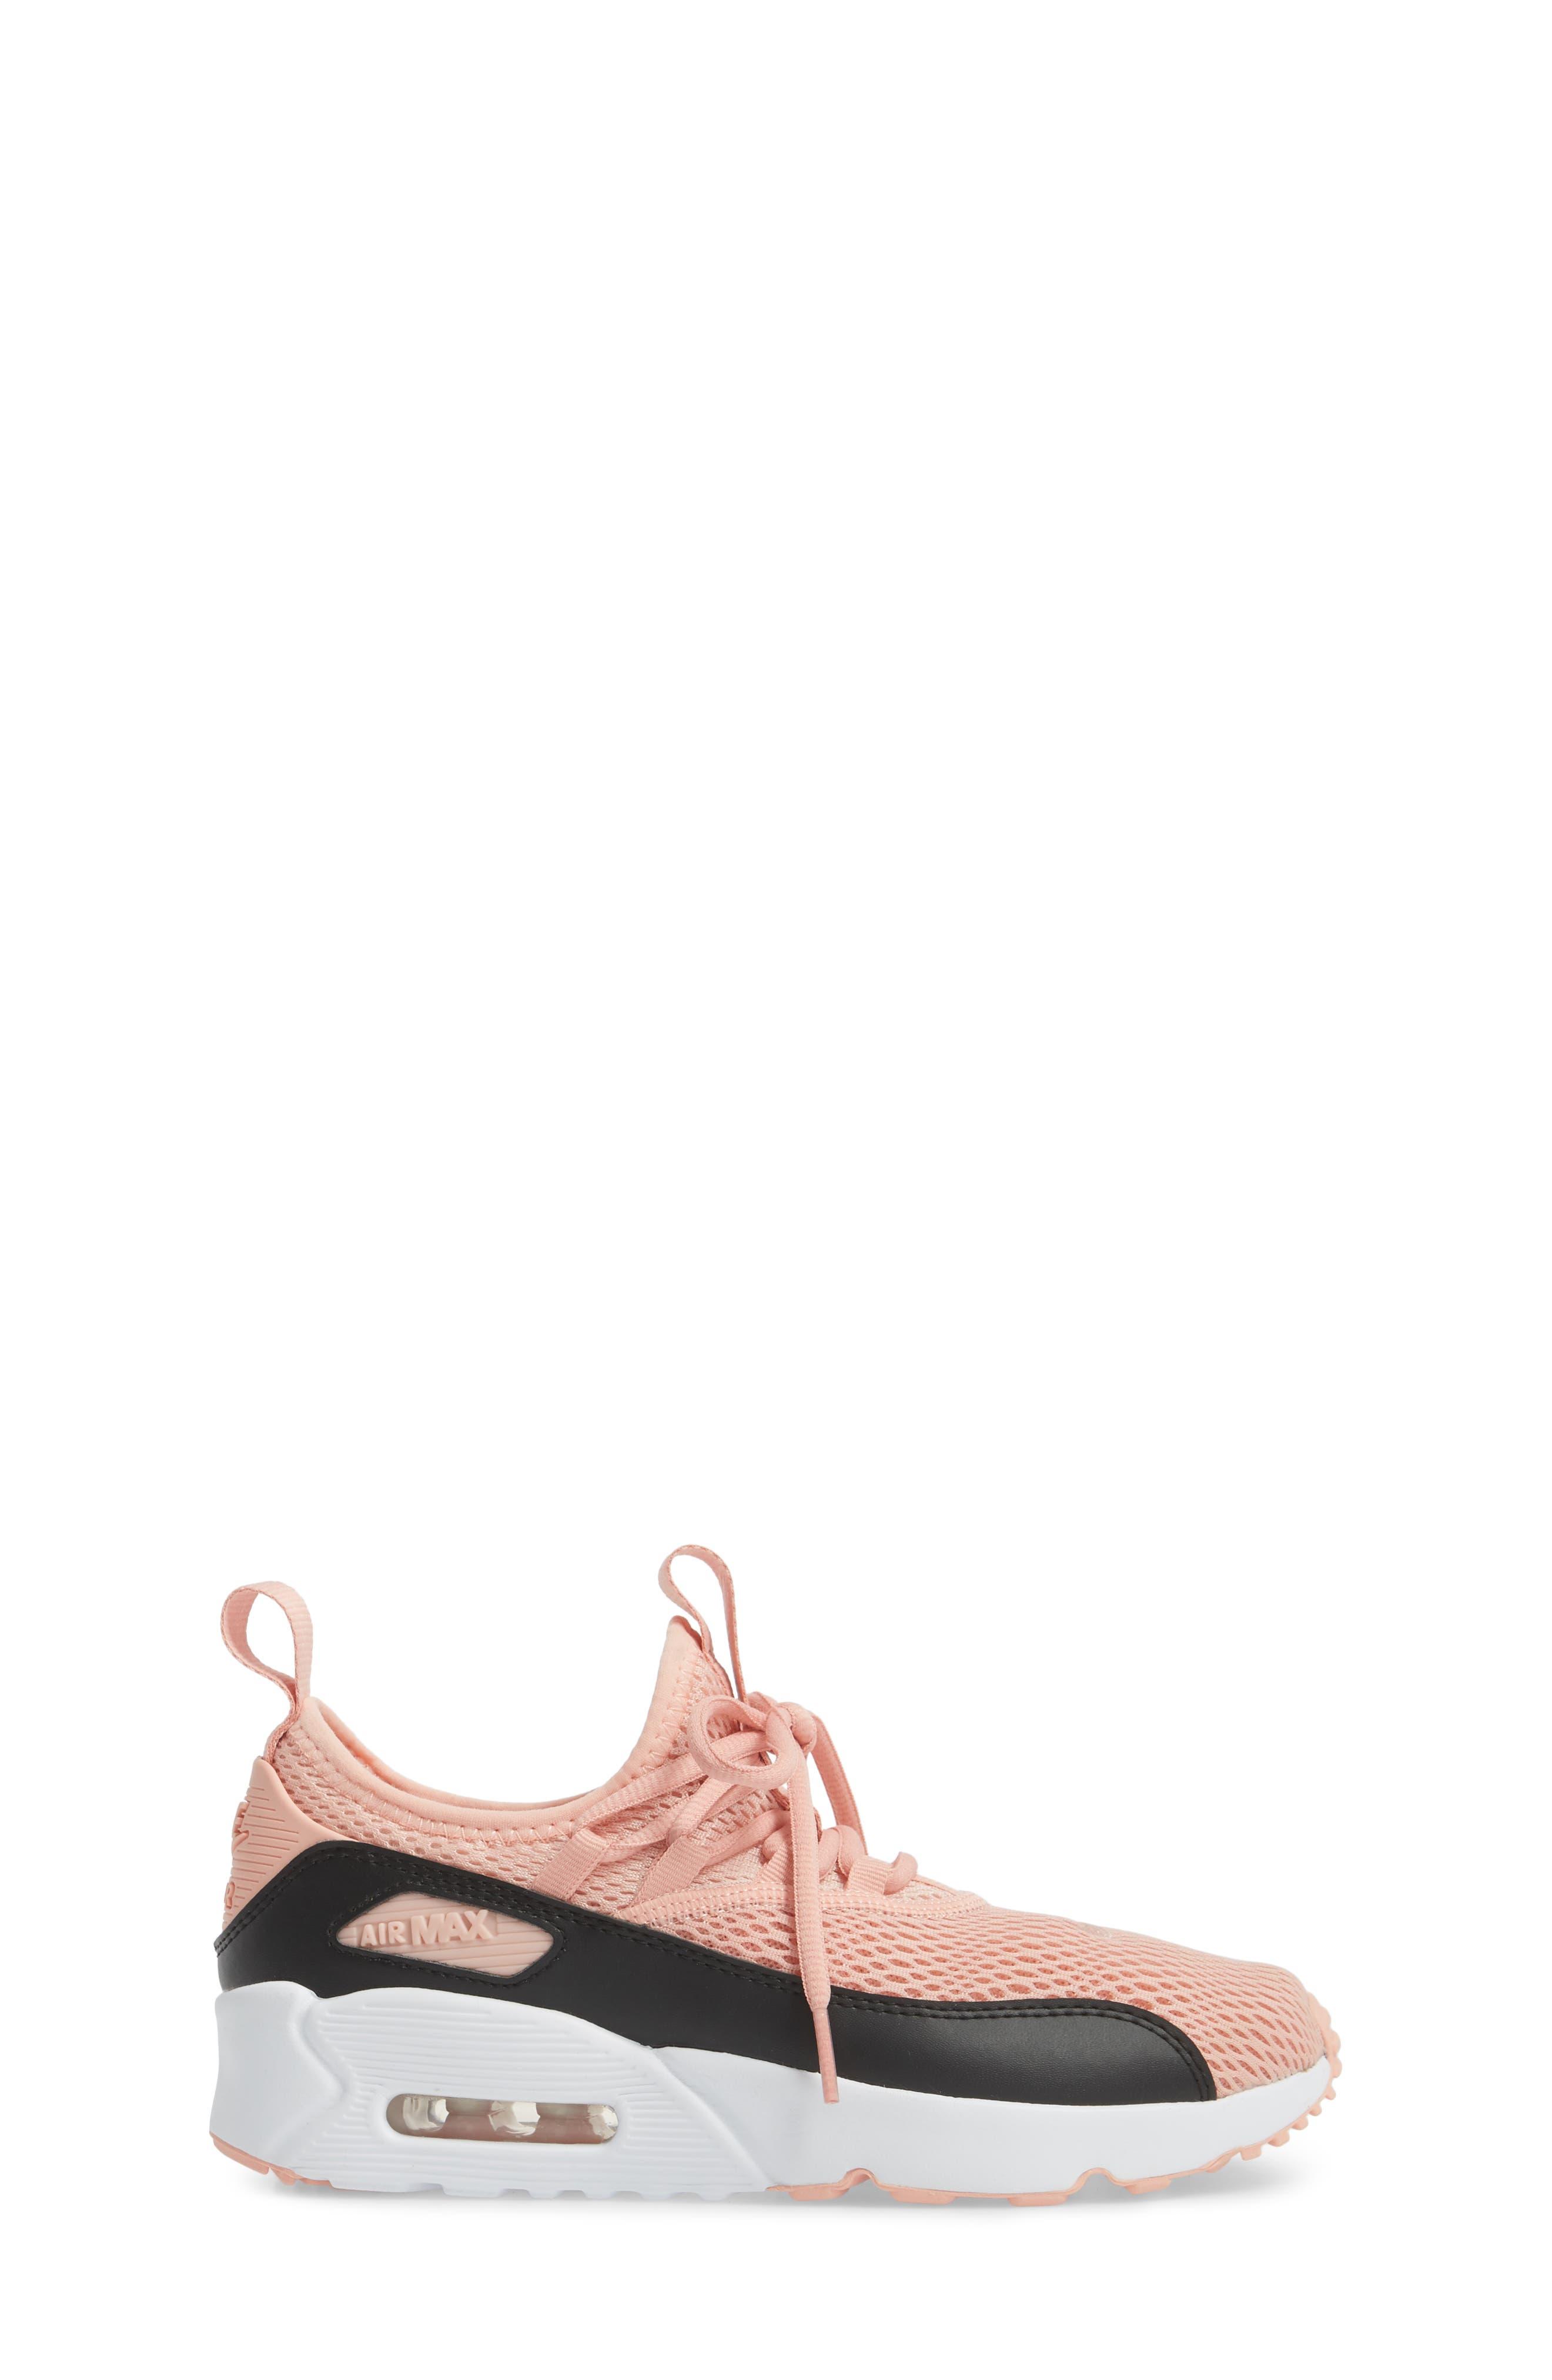 Air Max 90 EZ Sneaker,                             Alternate thumbnail 3, color,                             Coral Stardust/ Black